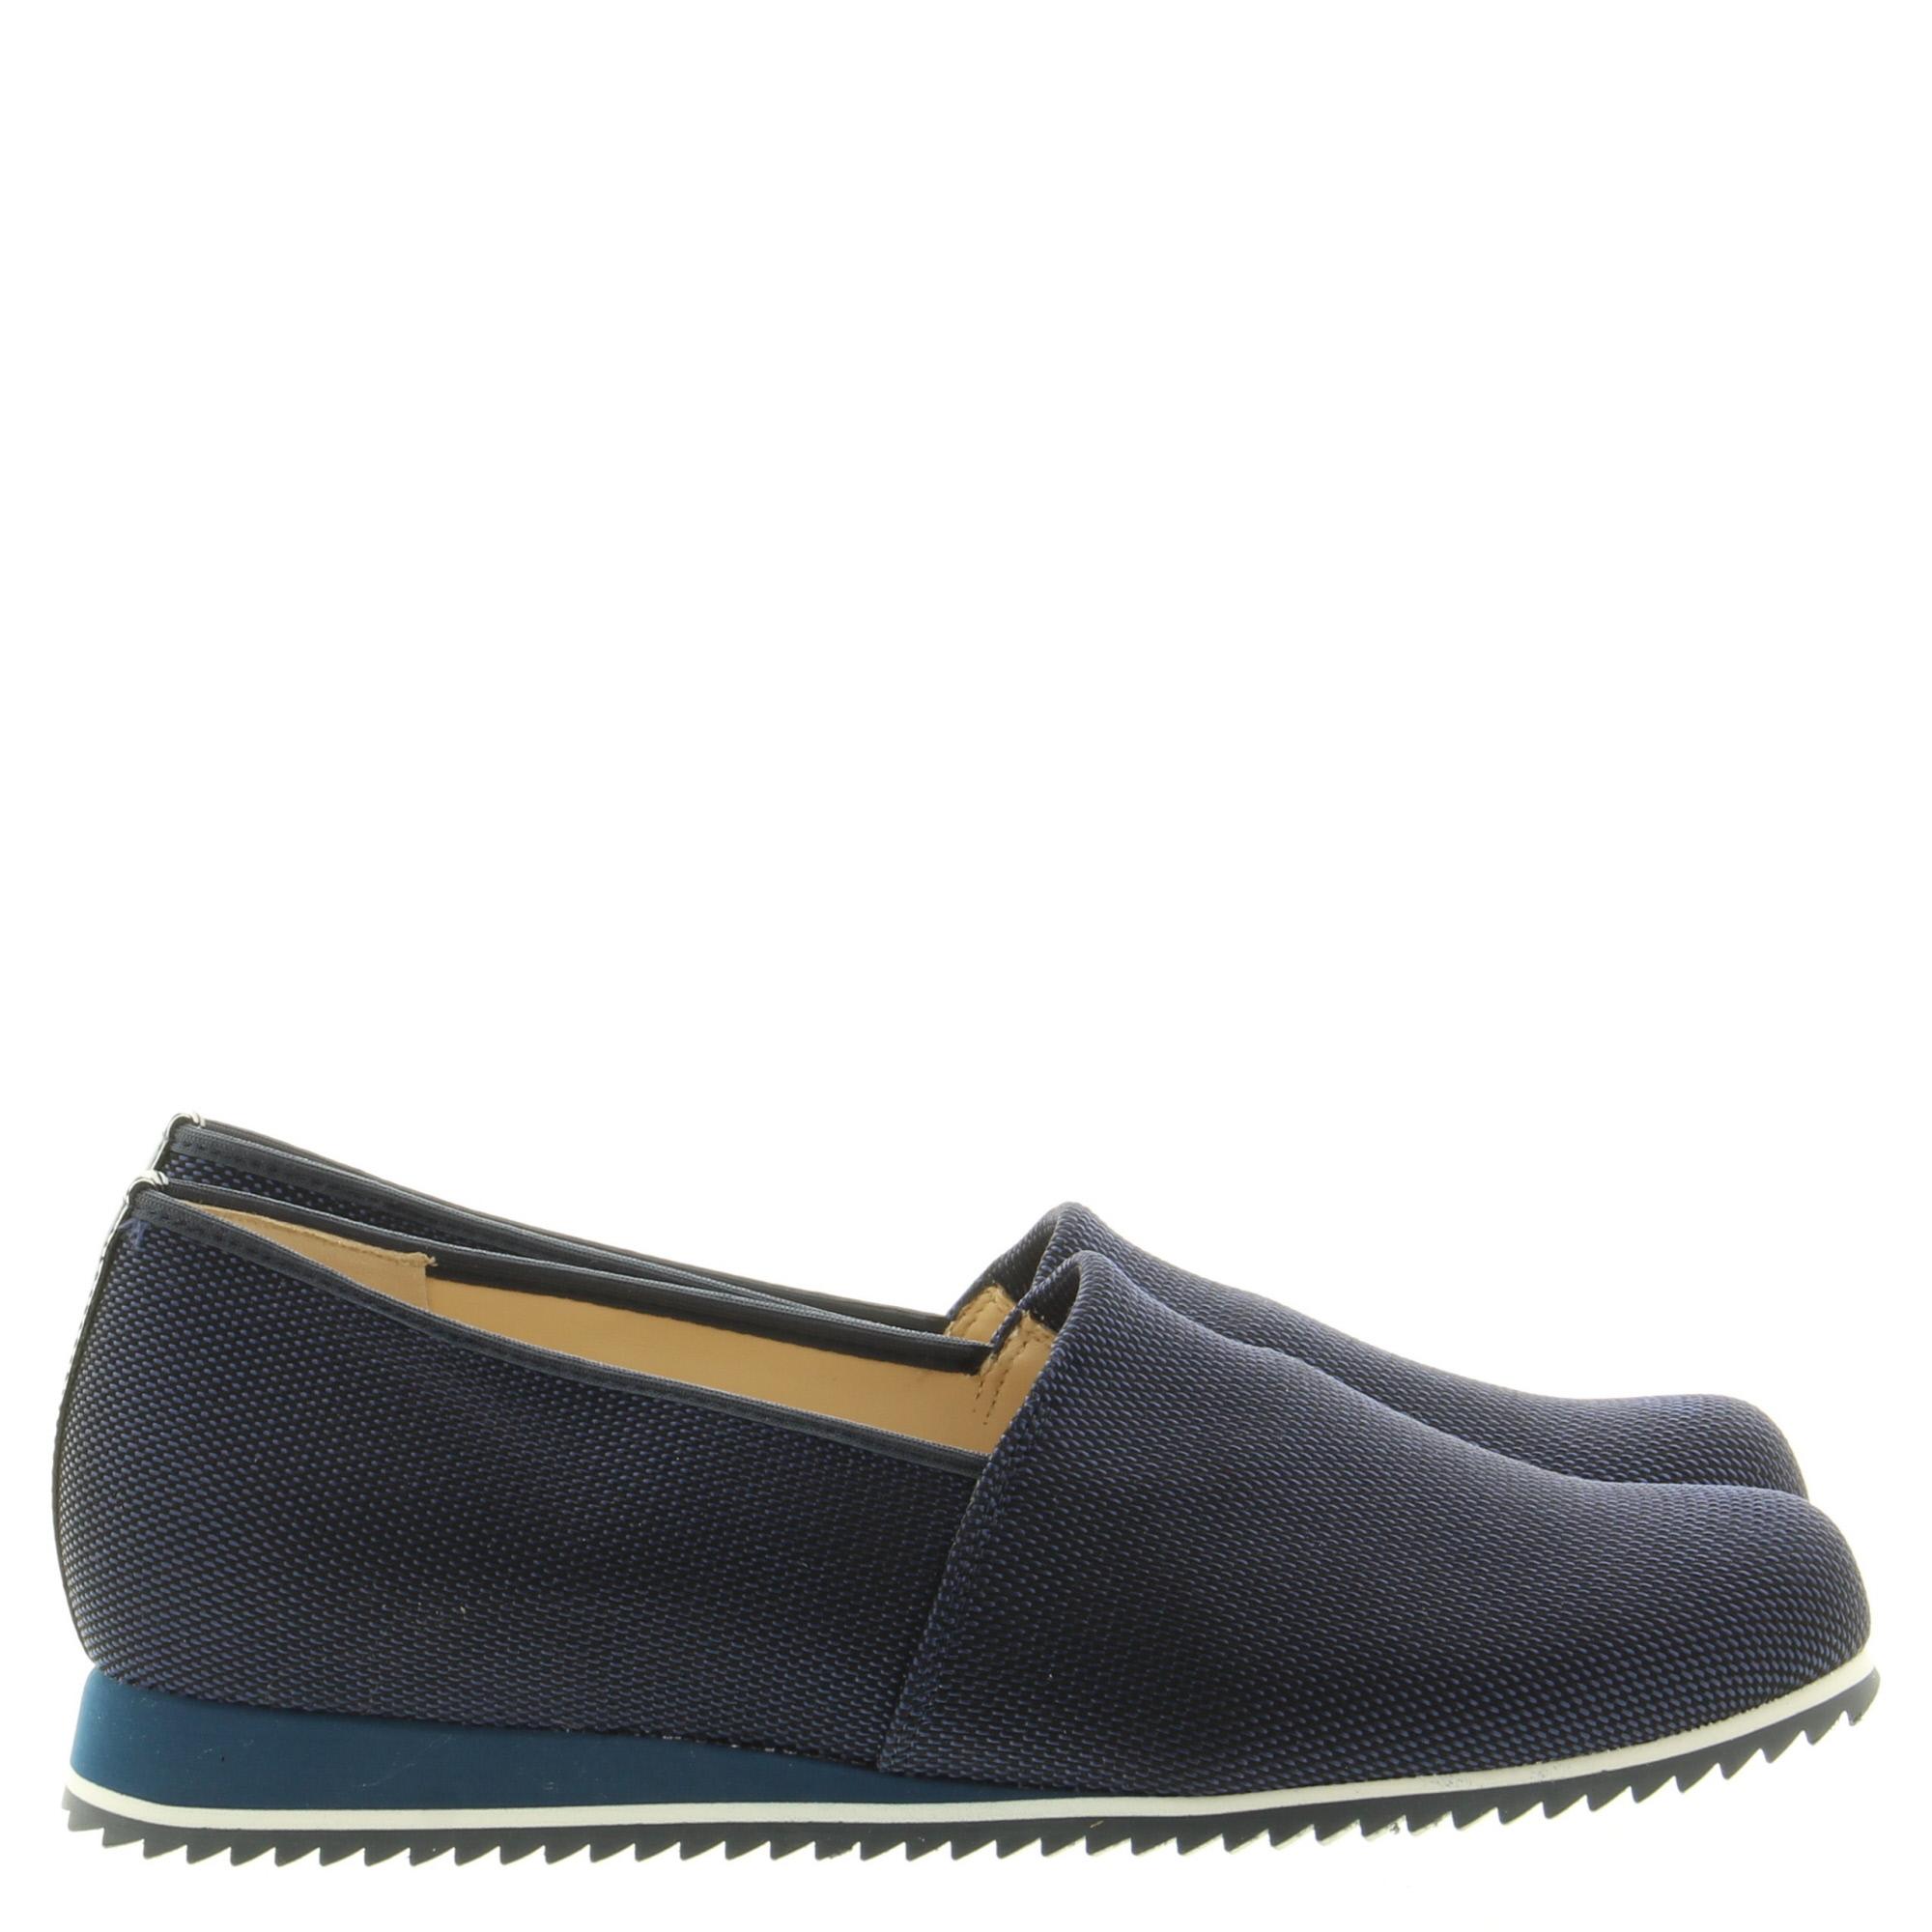 Hassia Shoes 301688 Piacenza 3000 Ocean